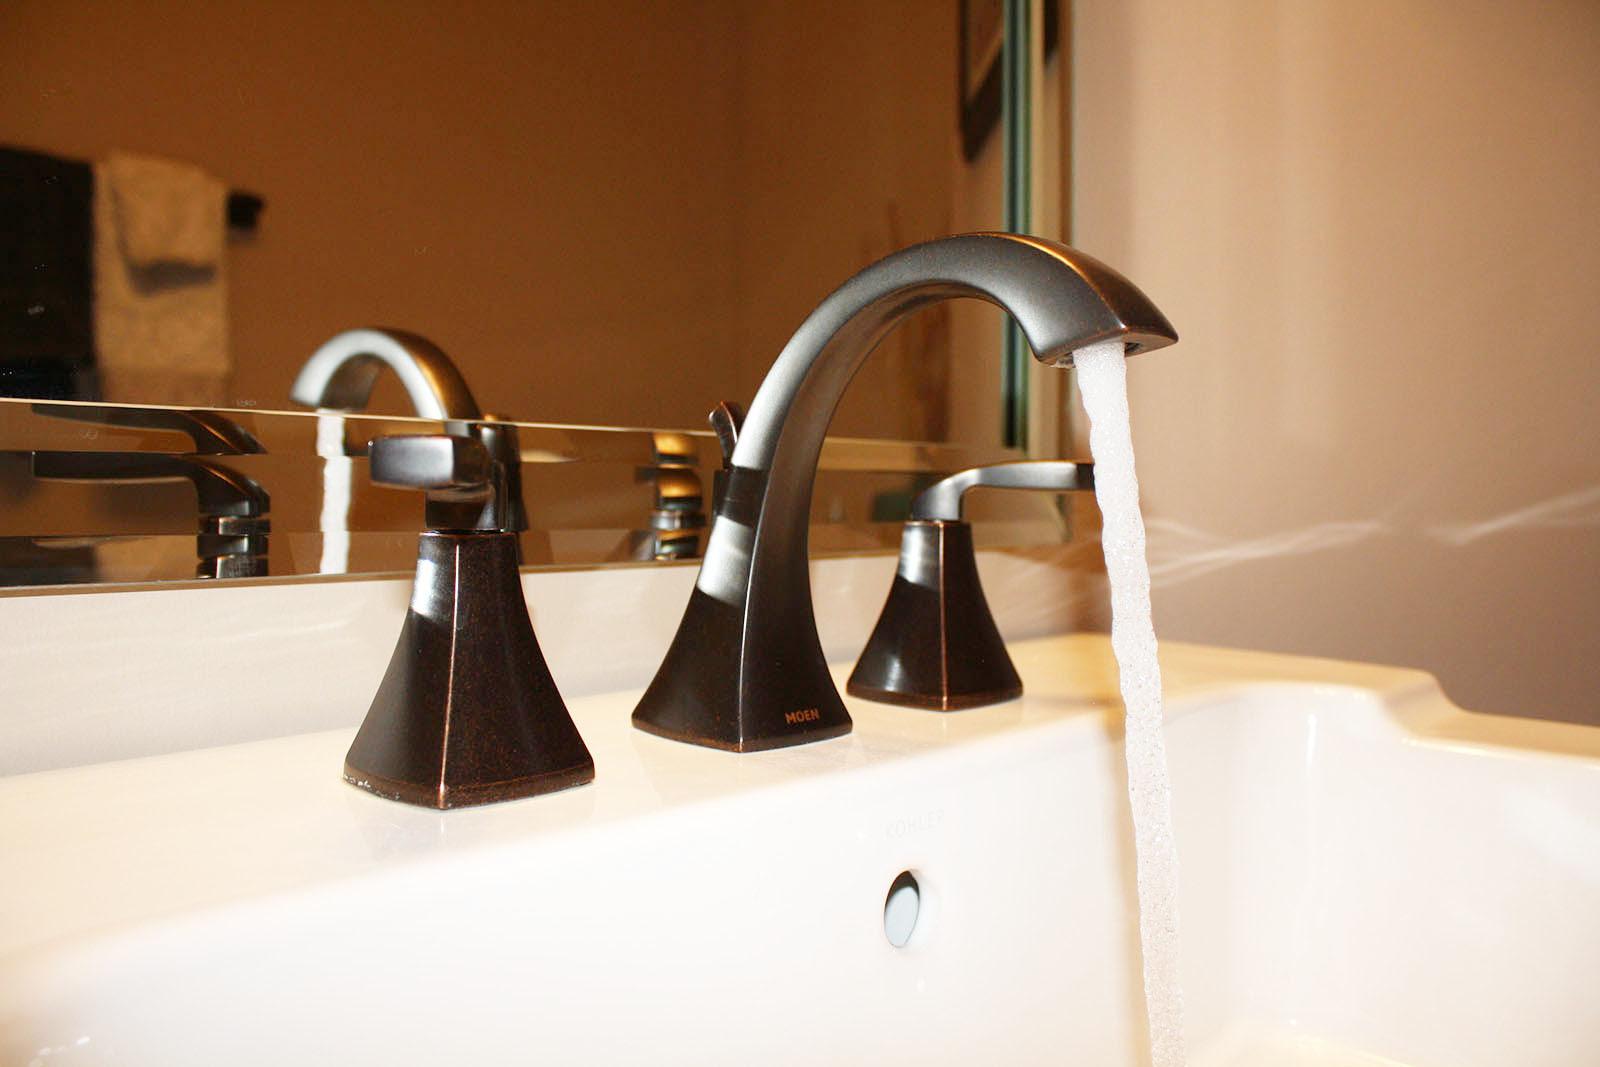 Moen Voss Faucet Series Review The Construction Academy